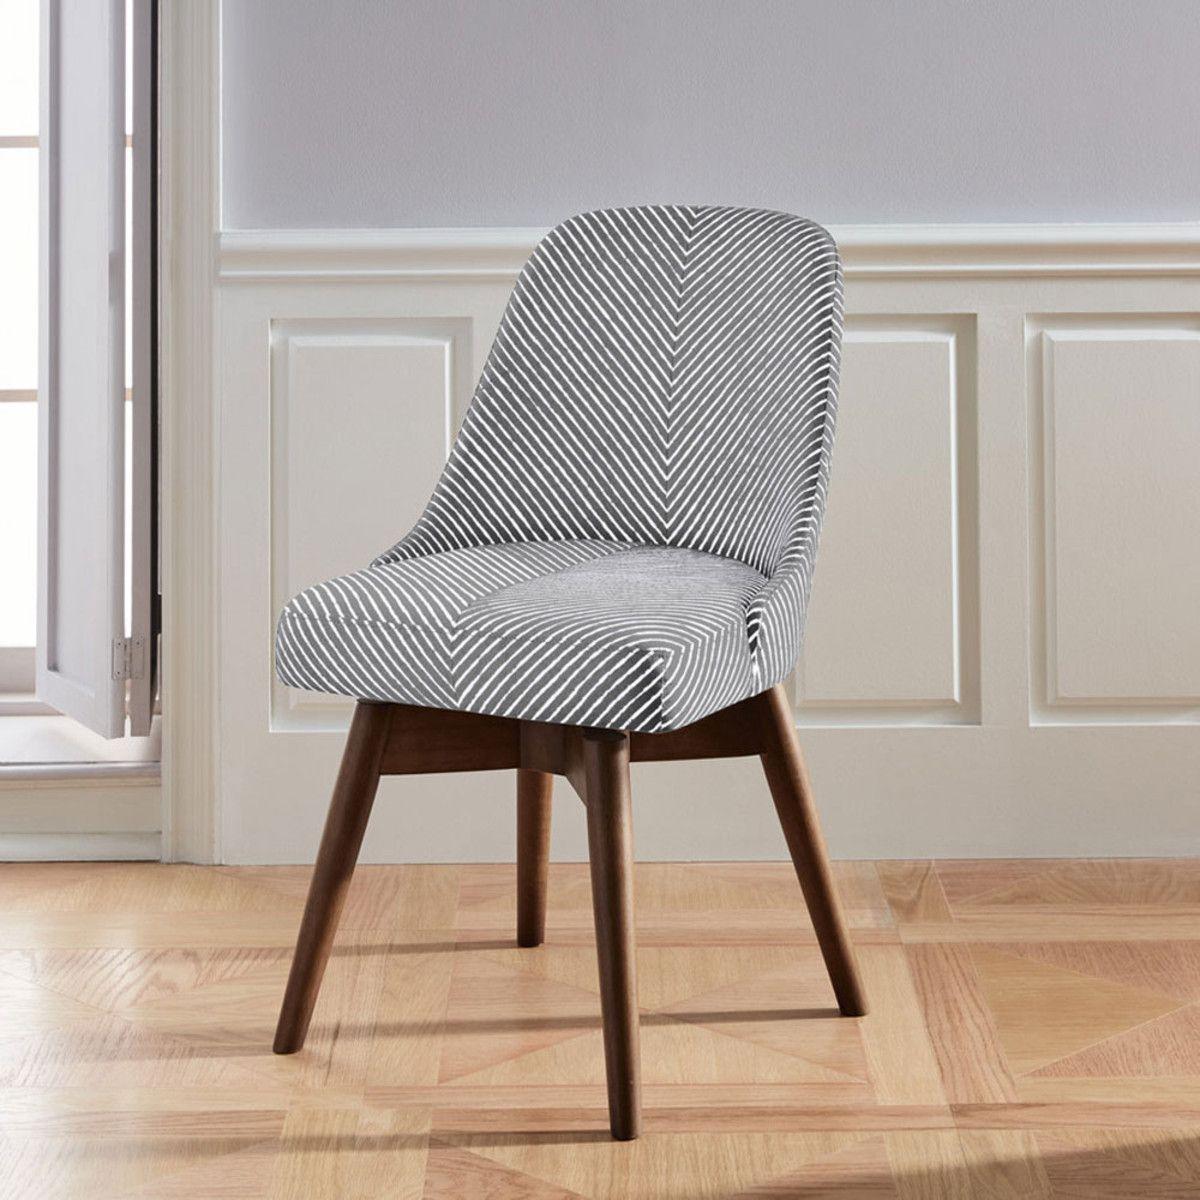 MidCentury Swivel Office Chair Painted Stripe